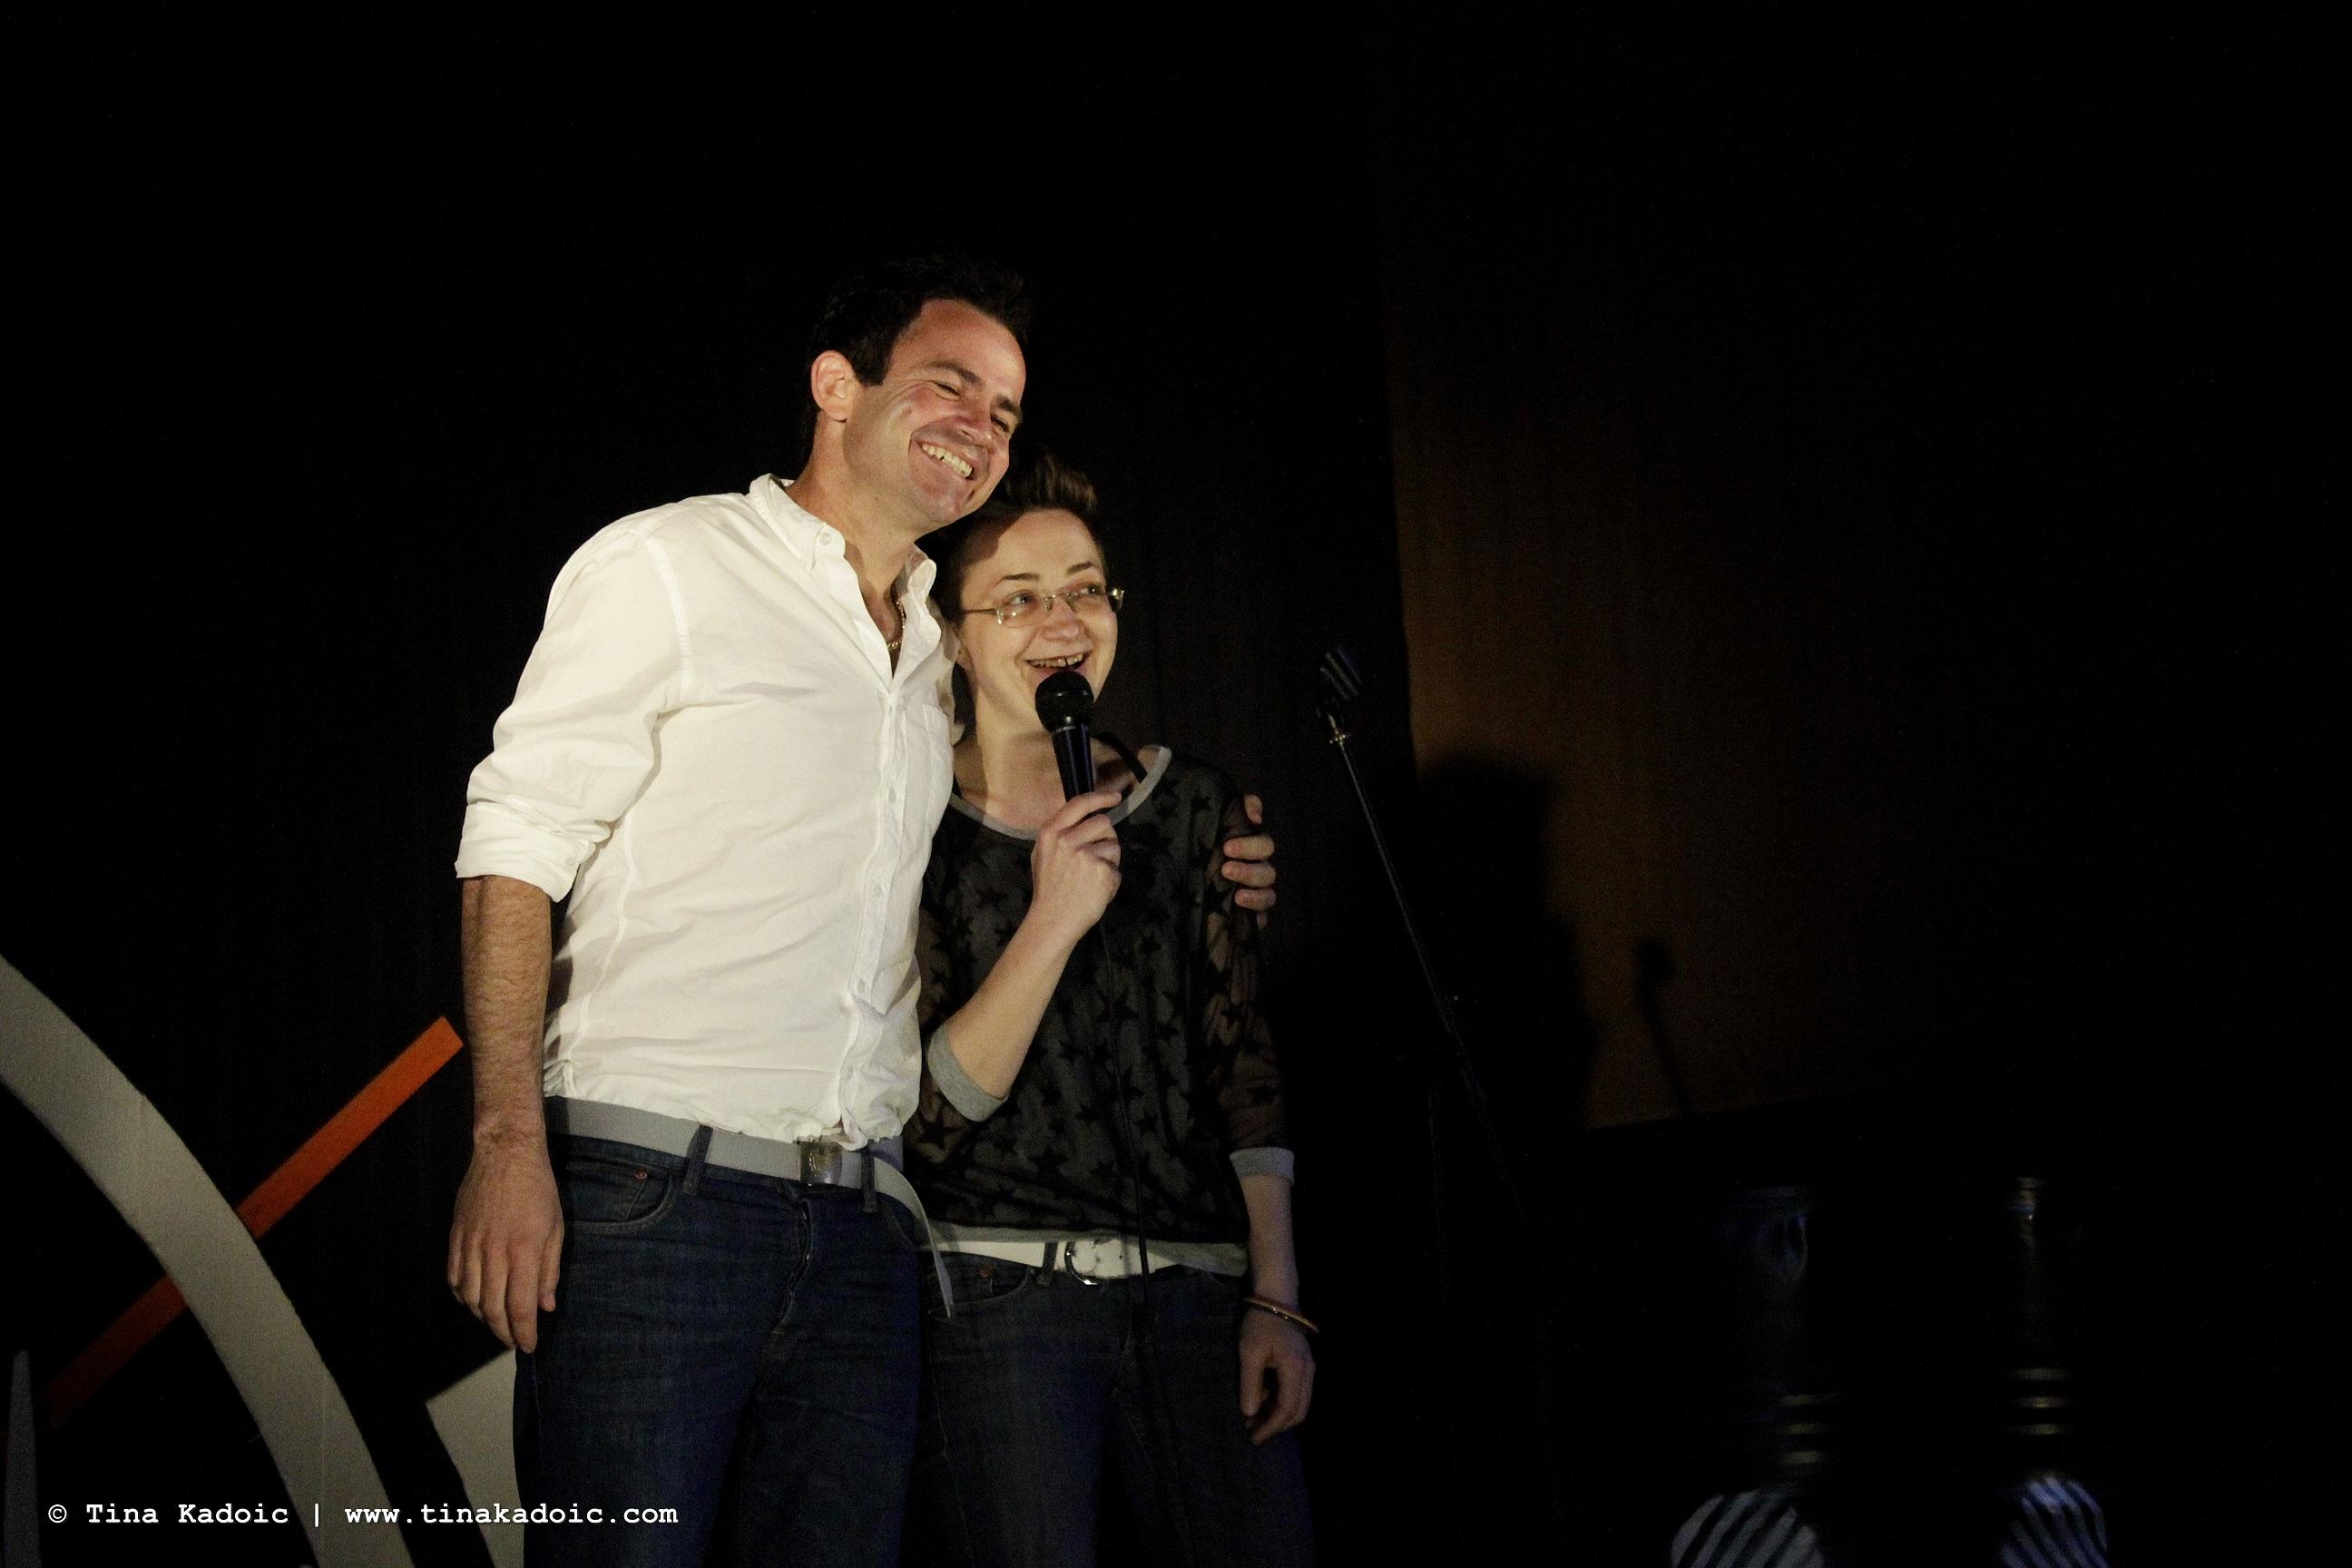 Marina and Edson